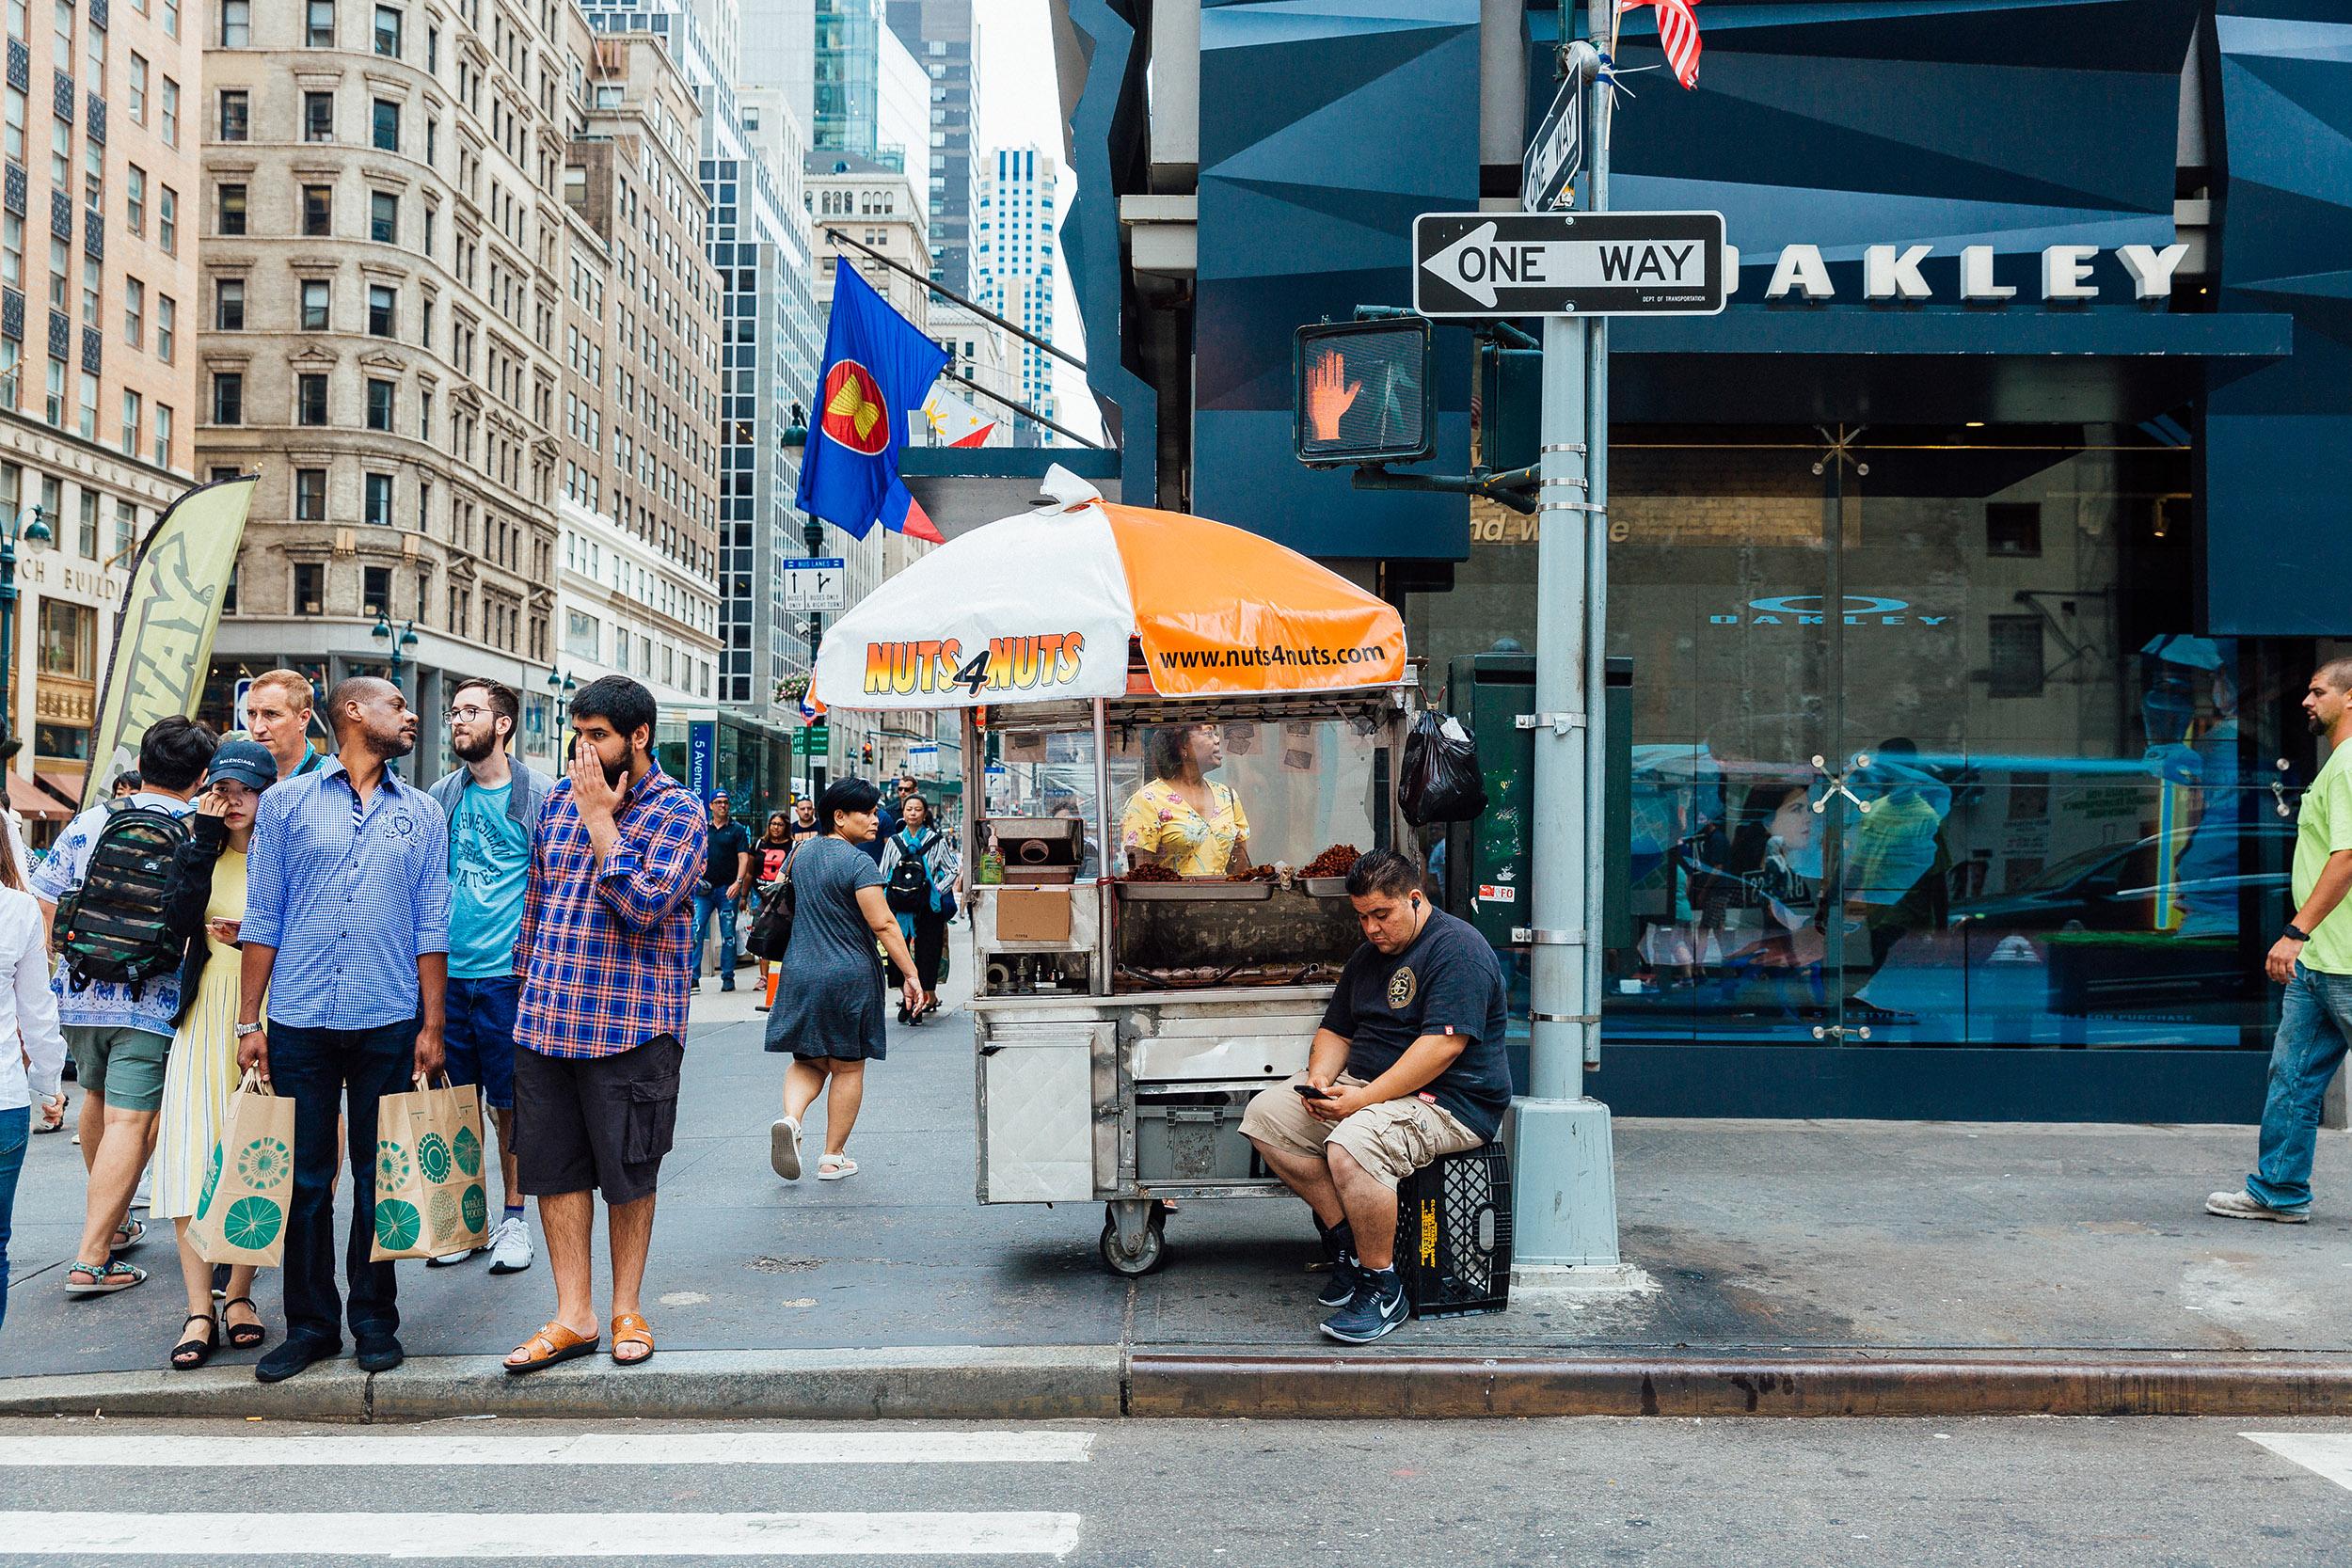 NYC_072018 (23 of 36).jpg